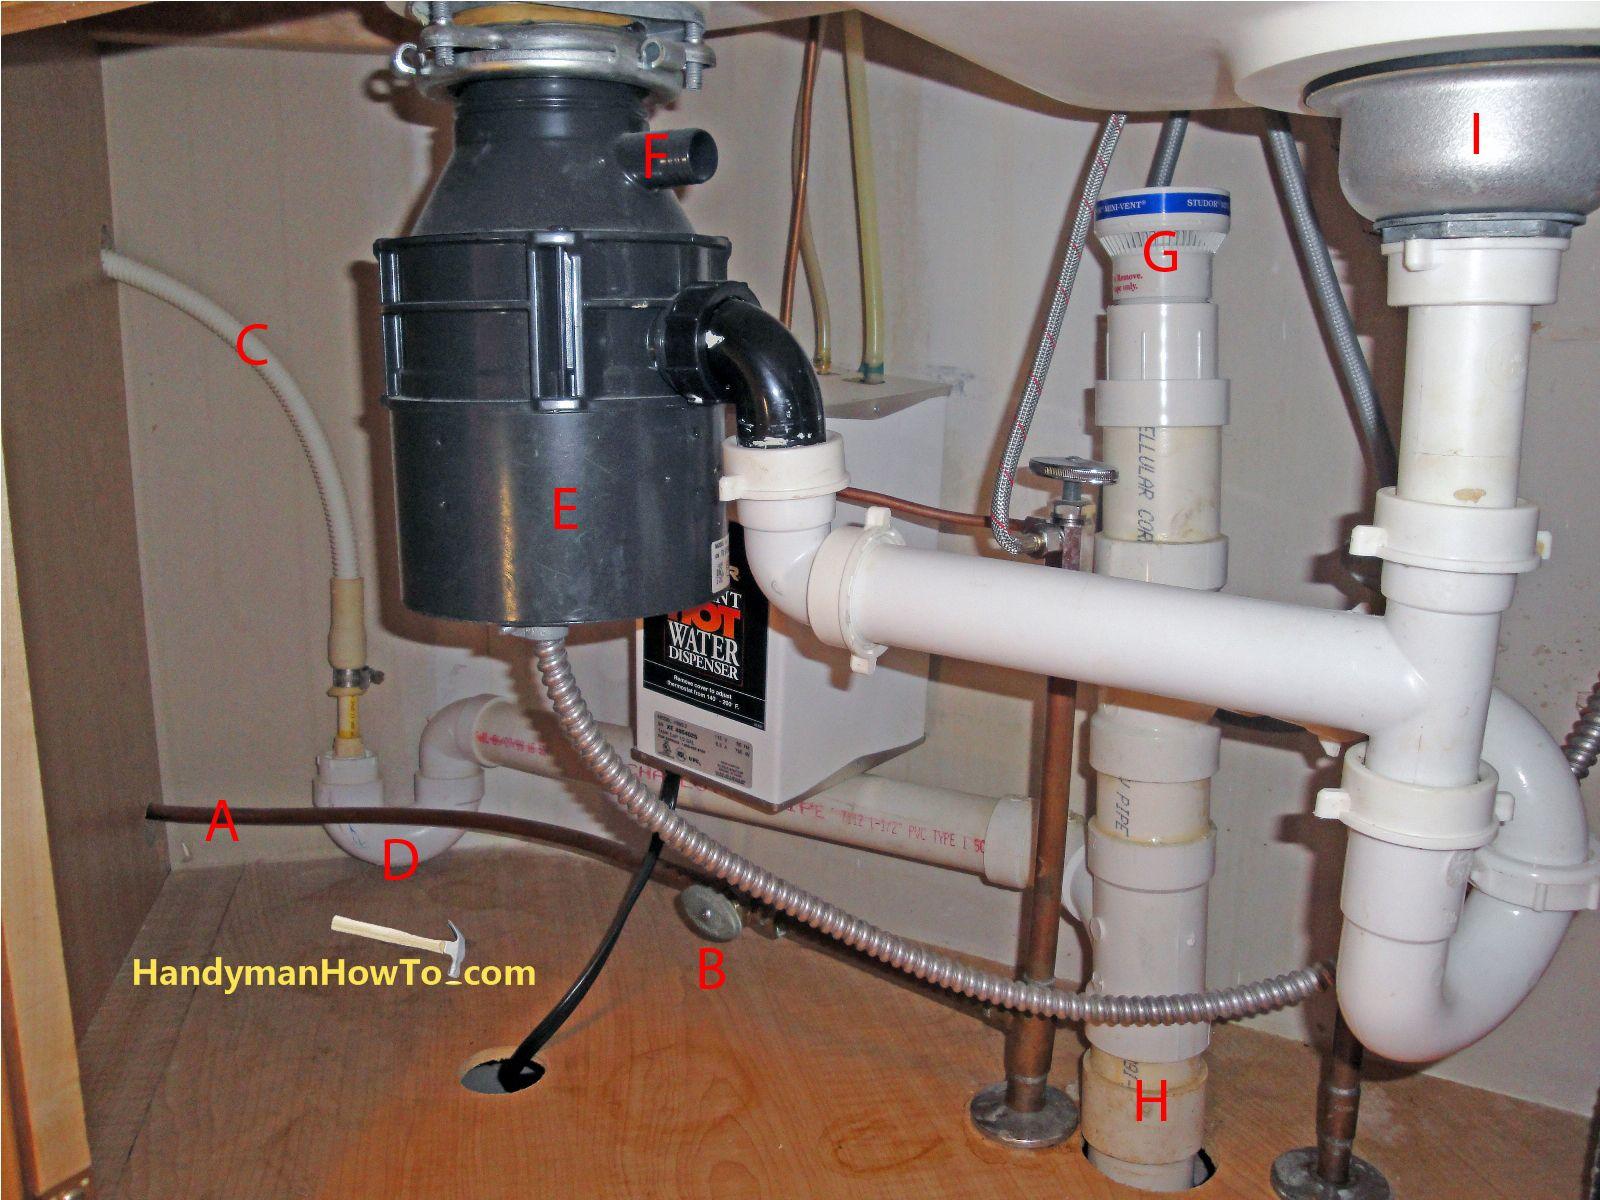 Kitchen Sink Drain Assembly Backsplash Glass Tile Plumbing With Dishwasher Great Ideas